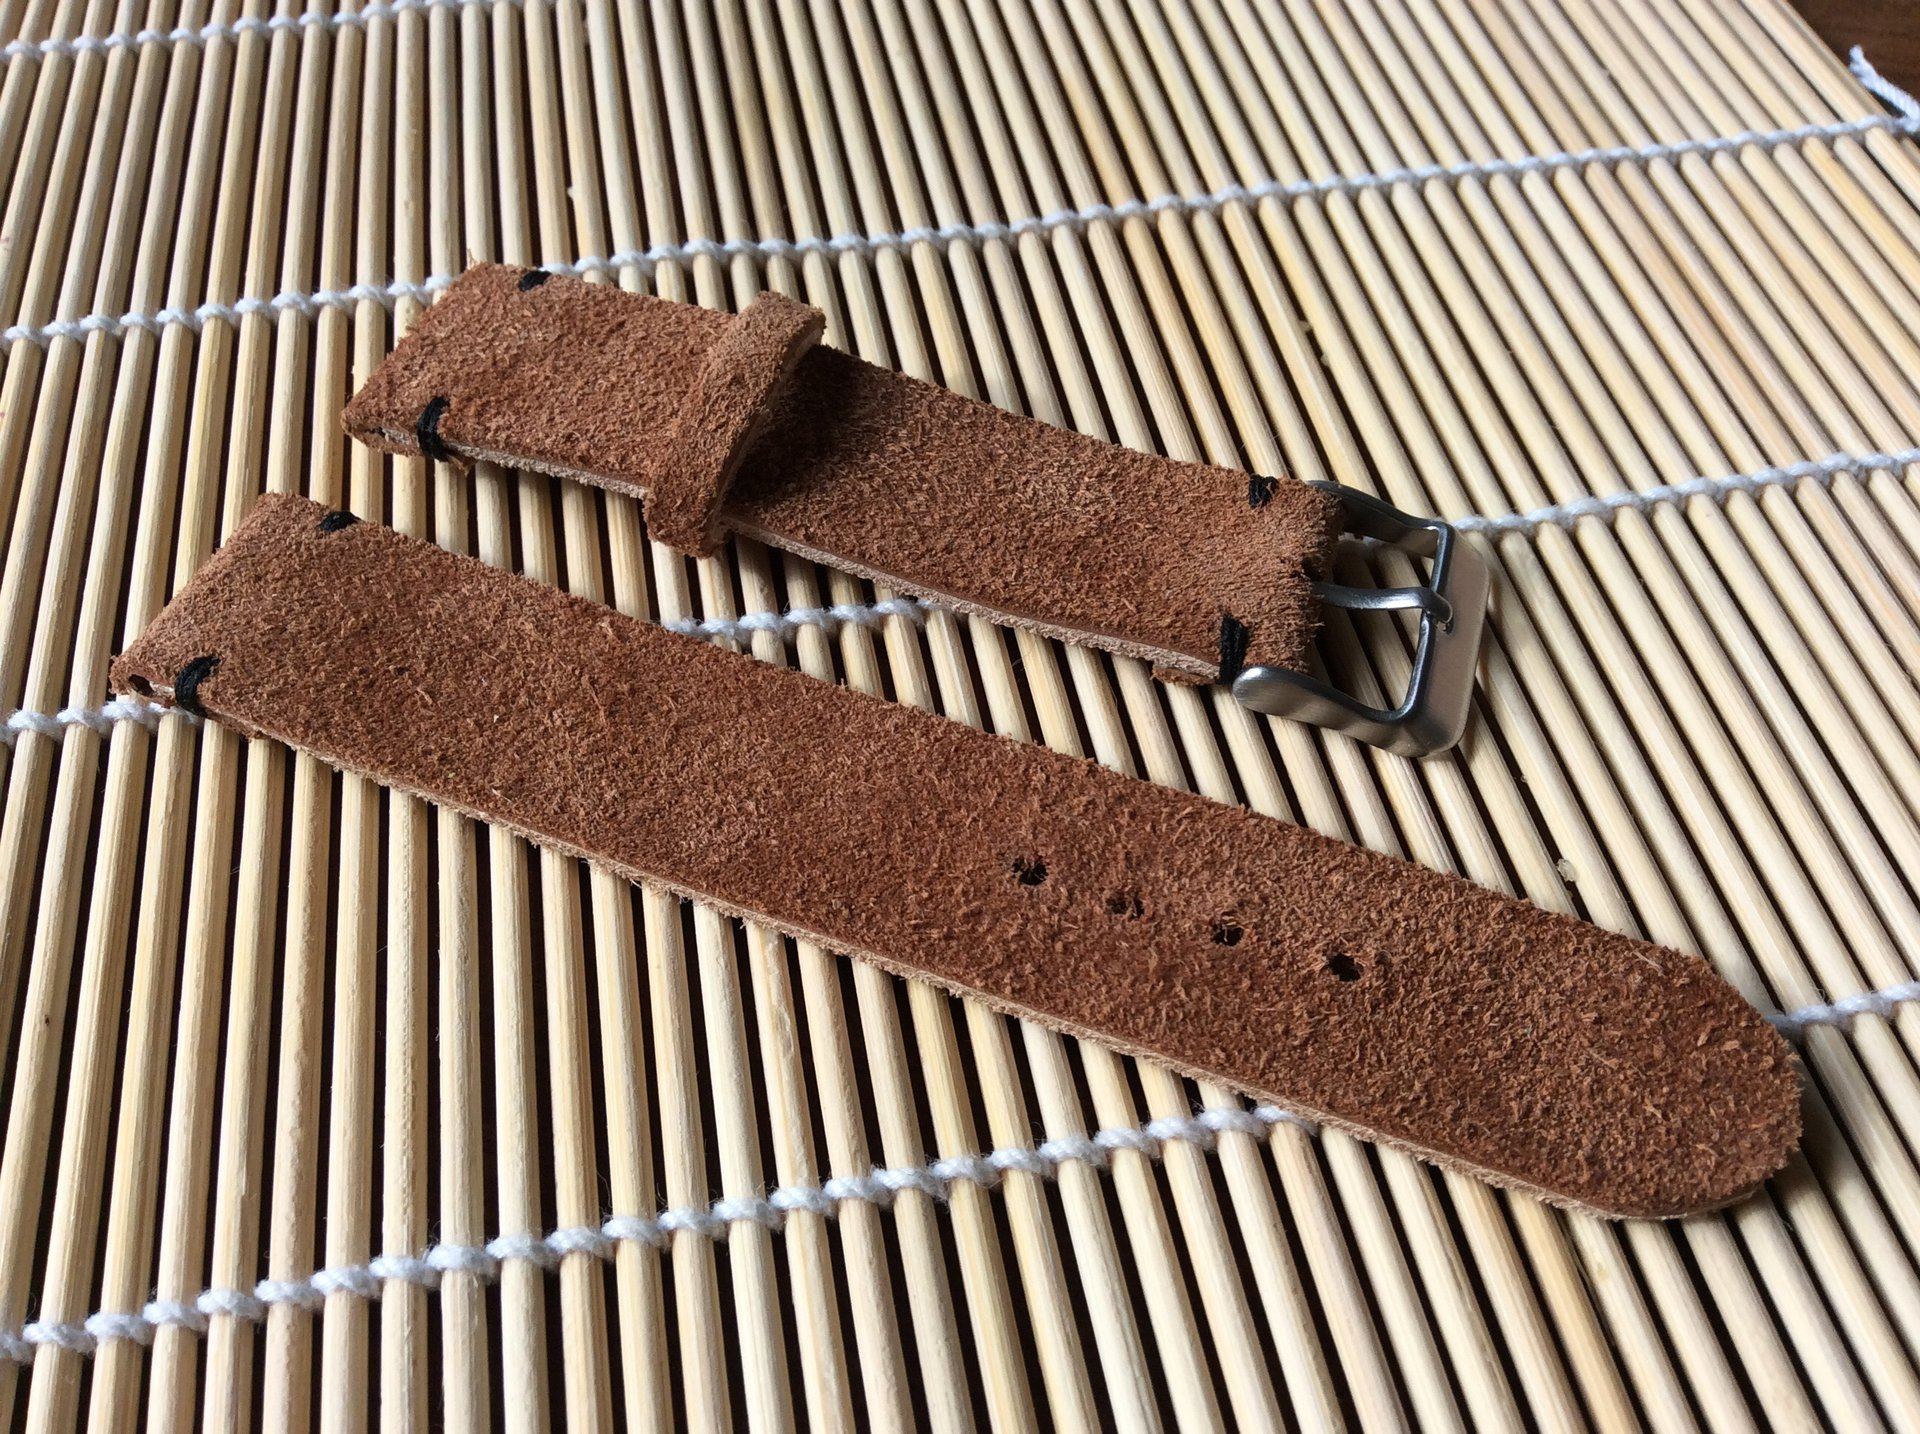 verkauf wildleder uhrenarmband 20 mm cognac braun uhrforum. Black Bedroom Furniture Sets. Home Design Ideas